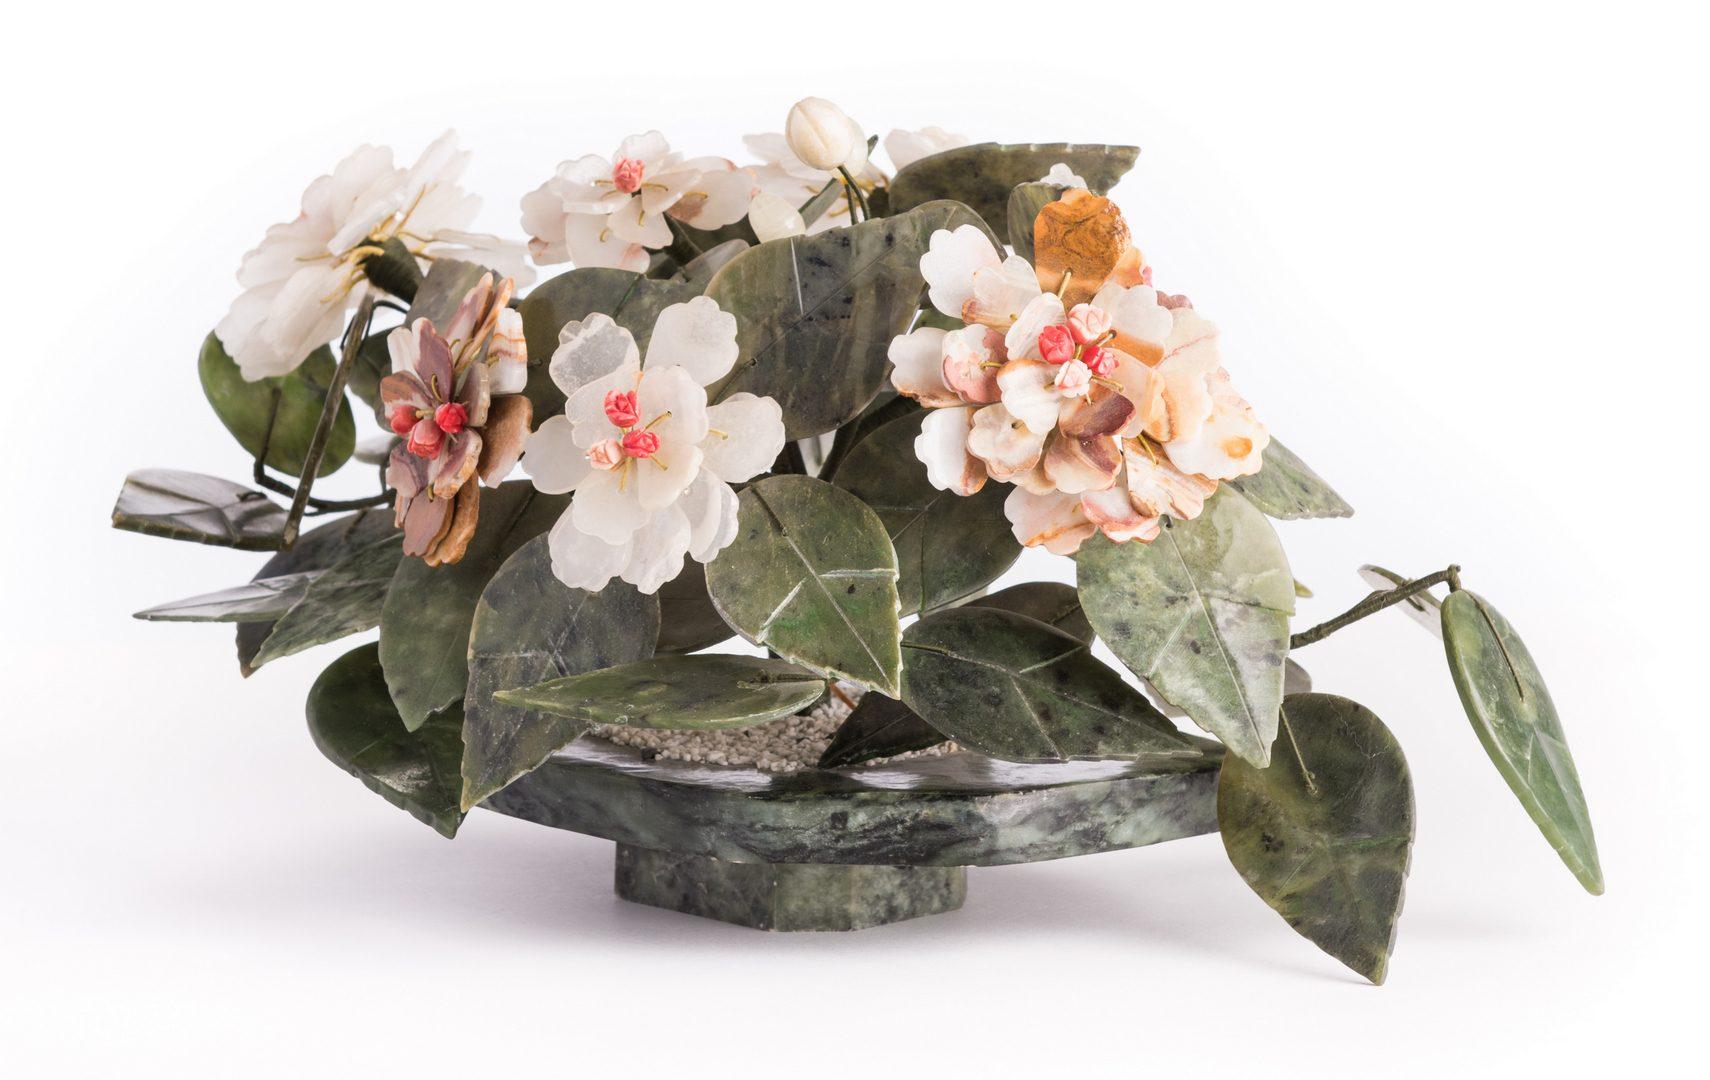 Lot 153: 3 Asian Hardstone Decorative Items